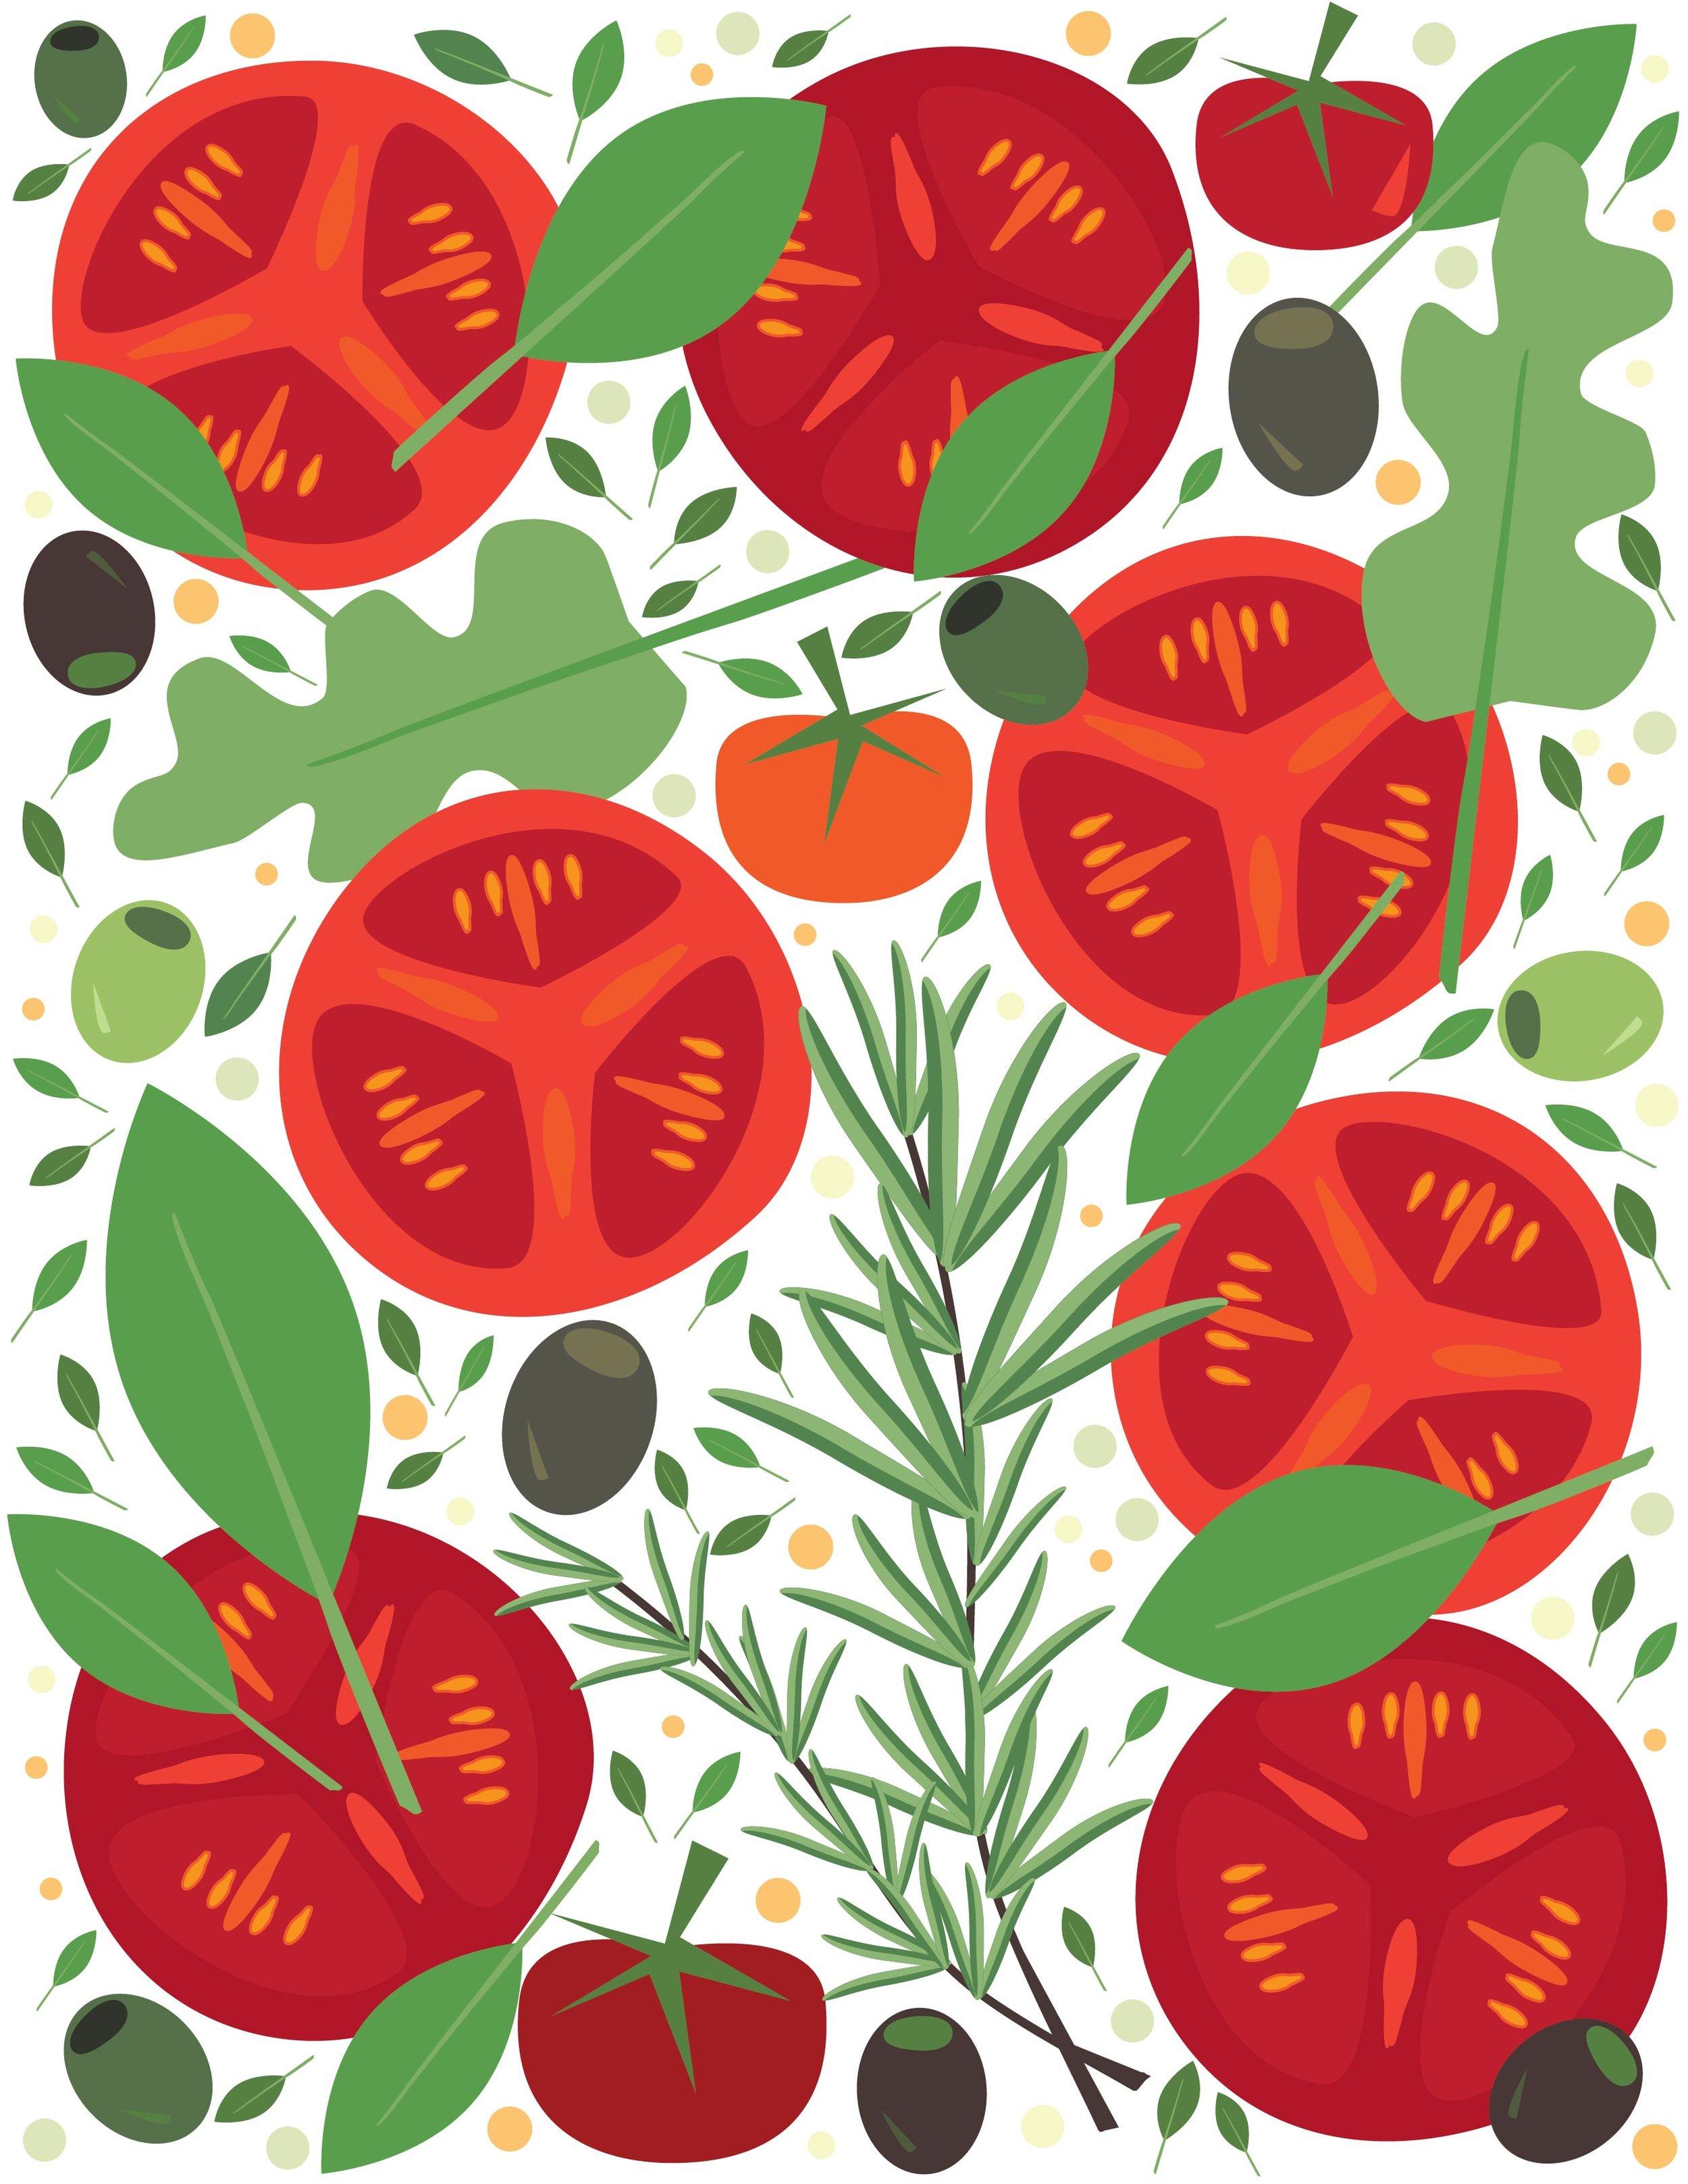 tomatoes-01.jpg